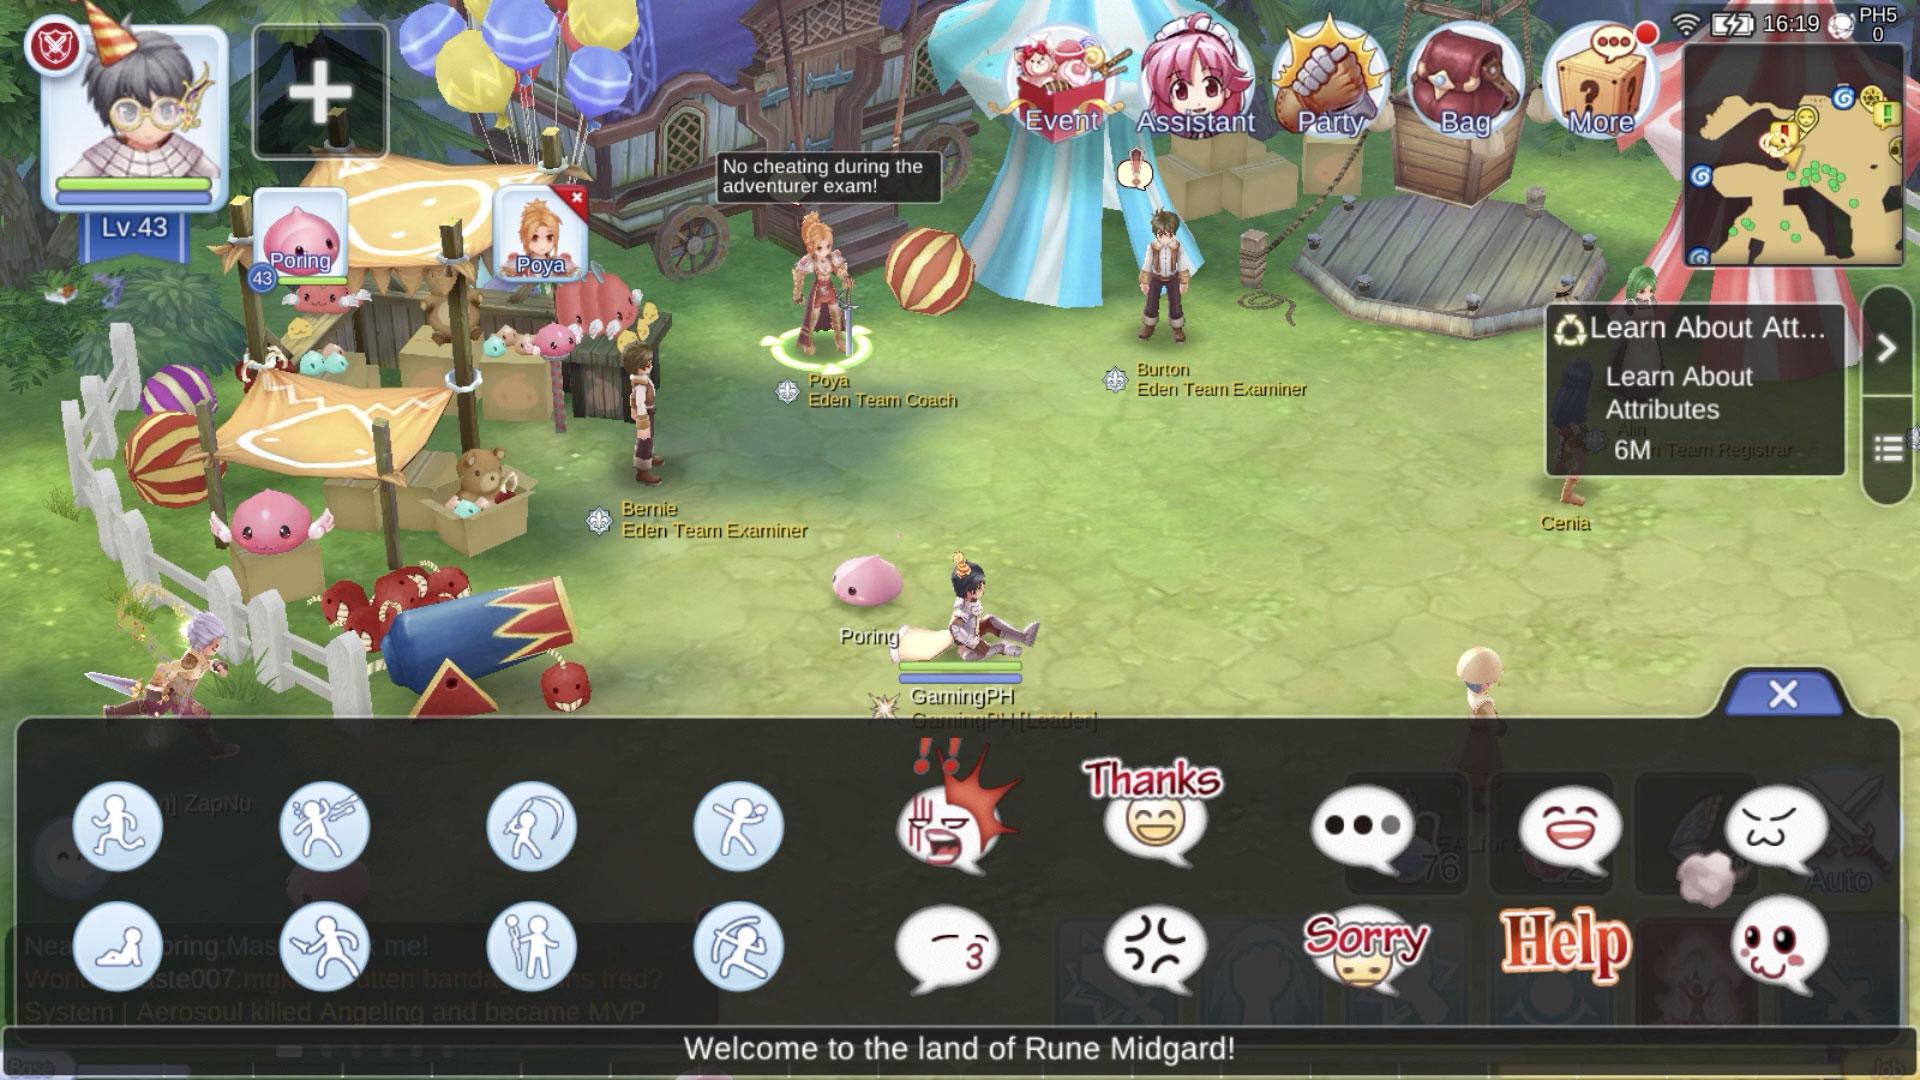 How To Sit Down Emoji Poses In Ragnarok M Eternal Love Gamingph Com